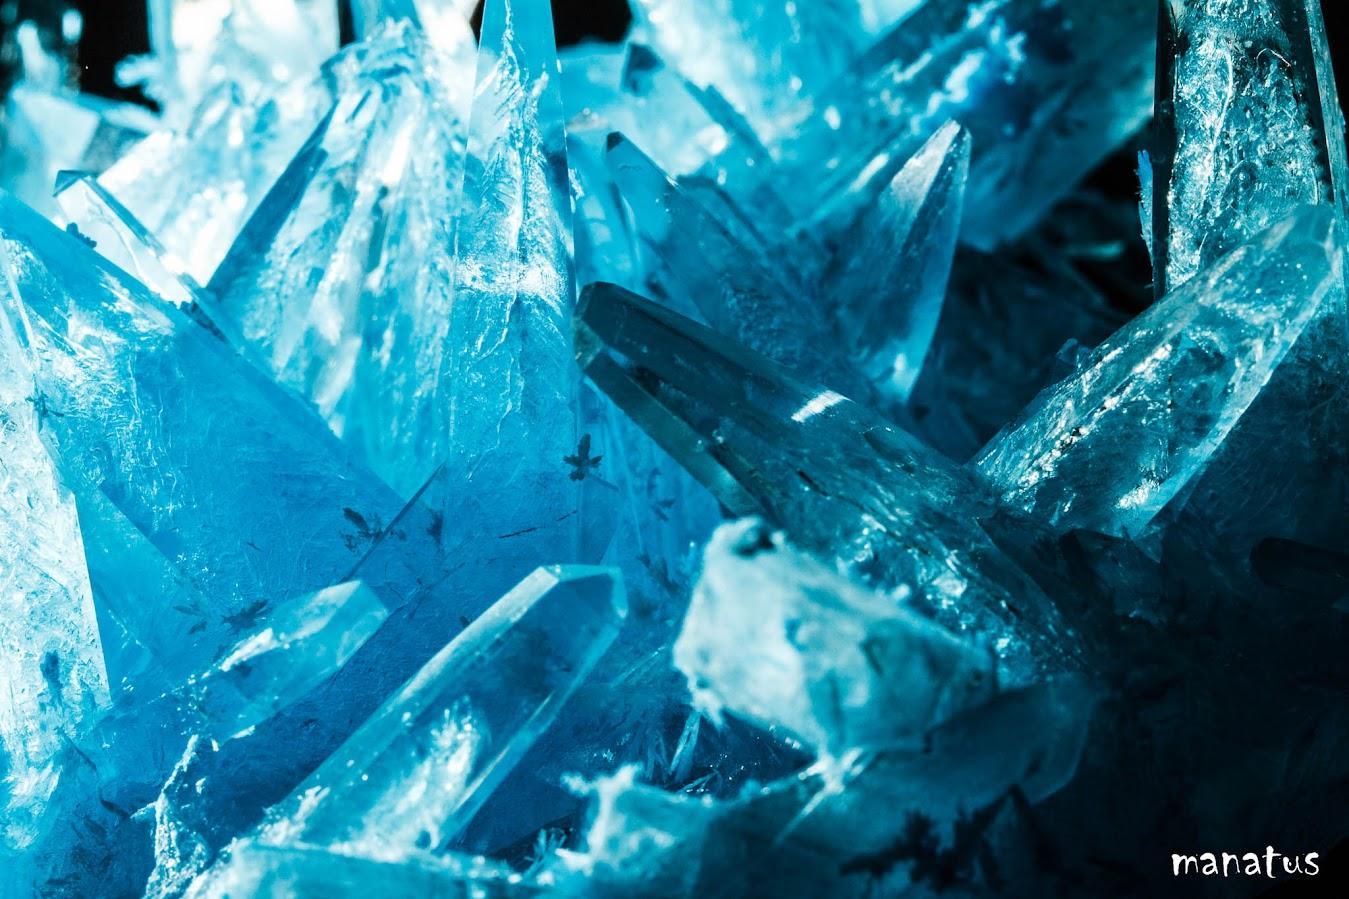 manatus cristal